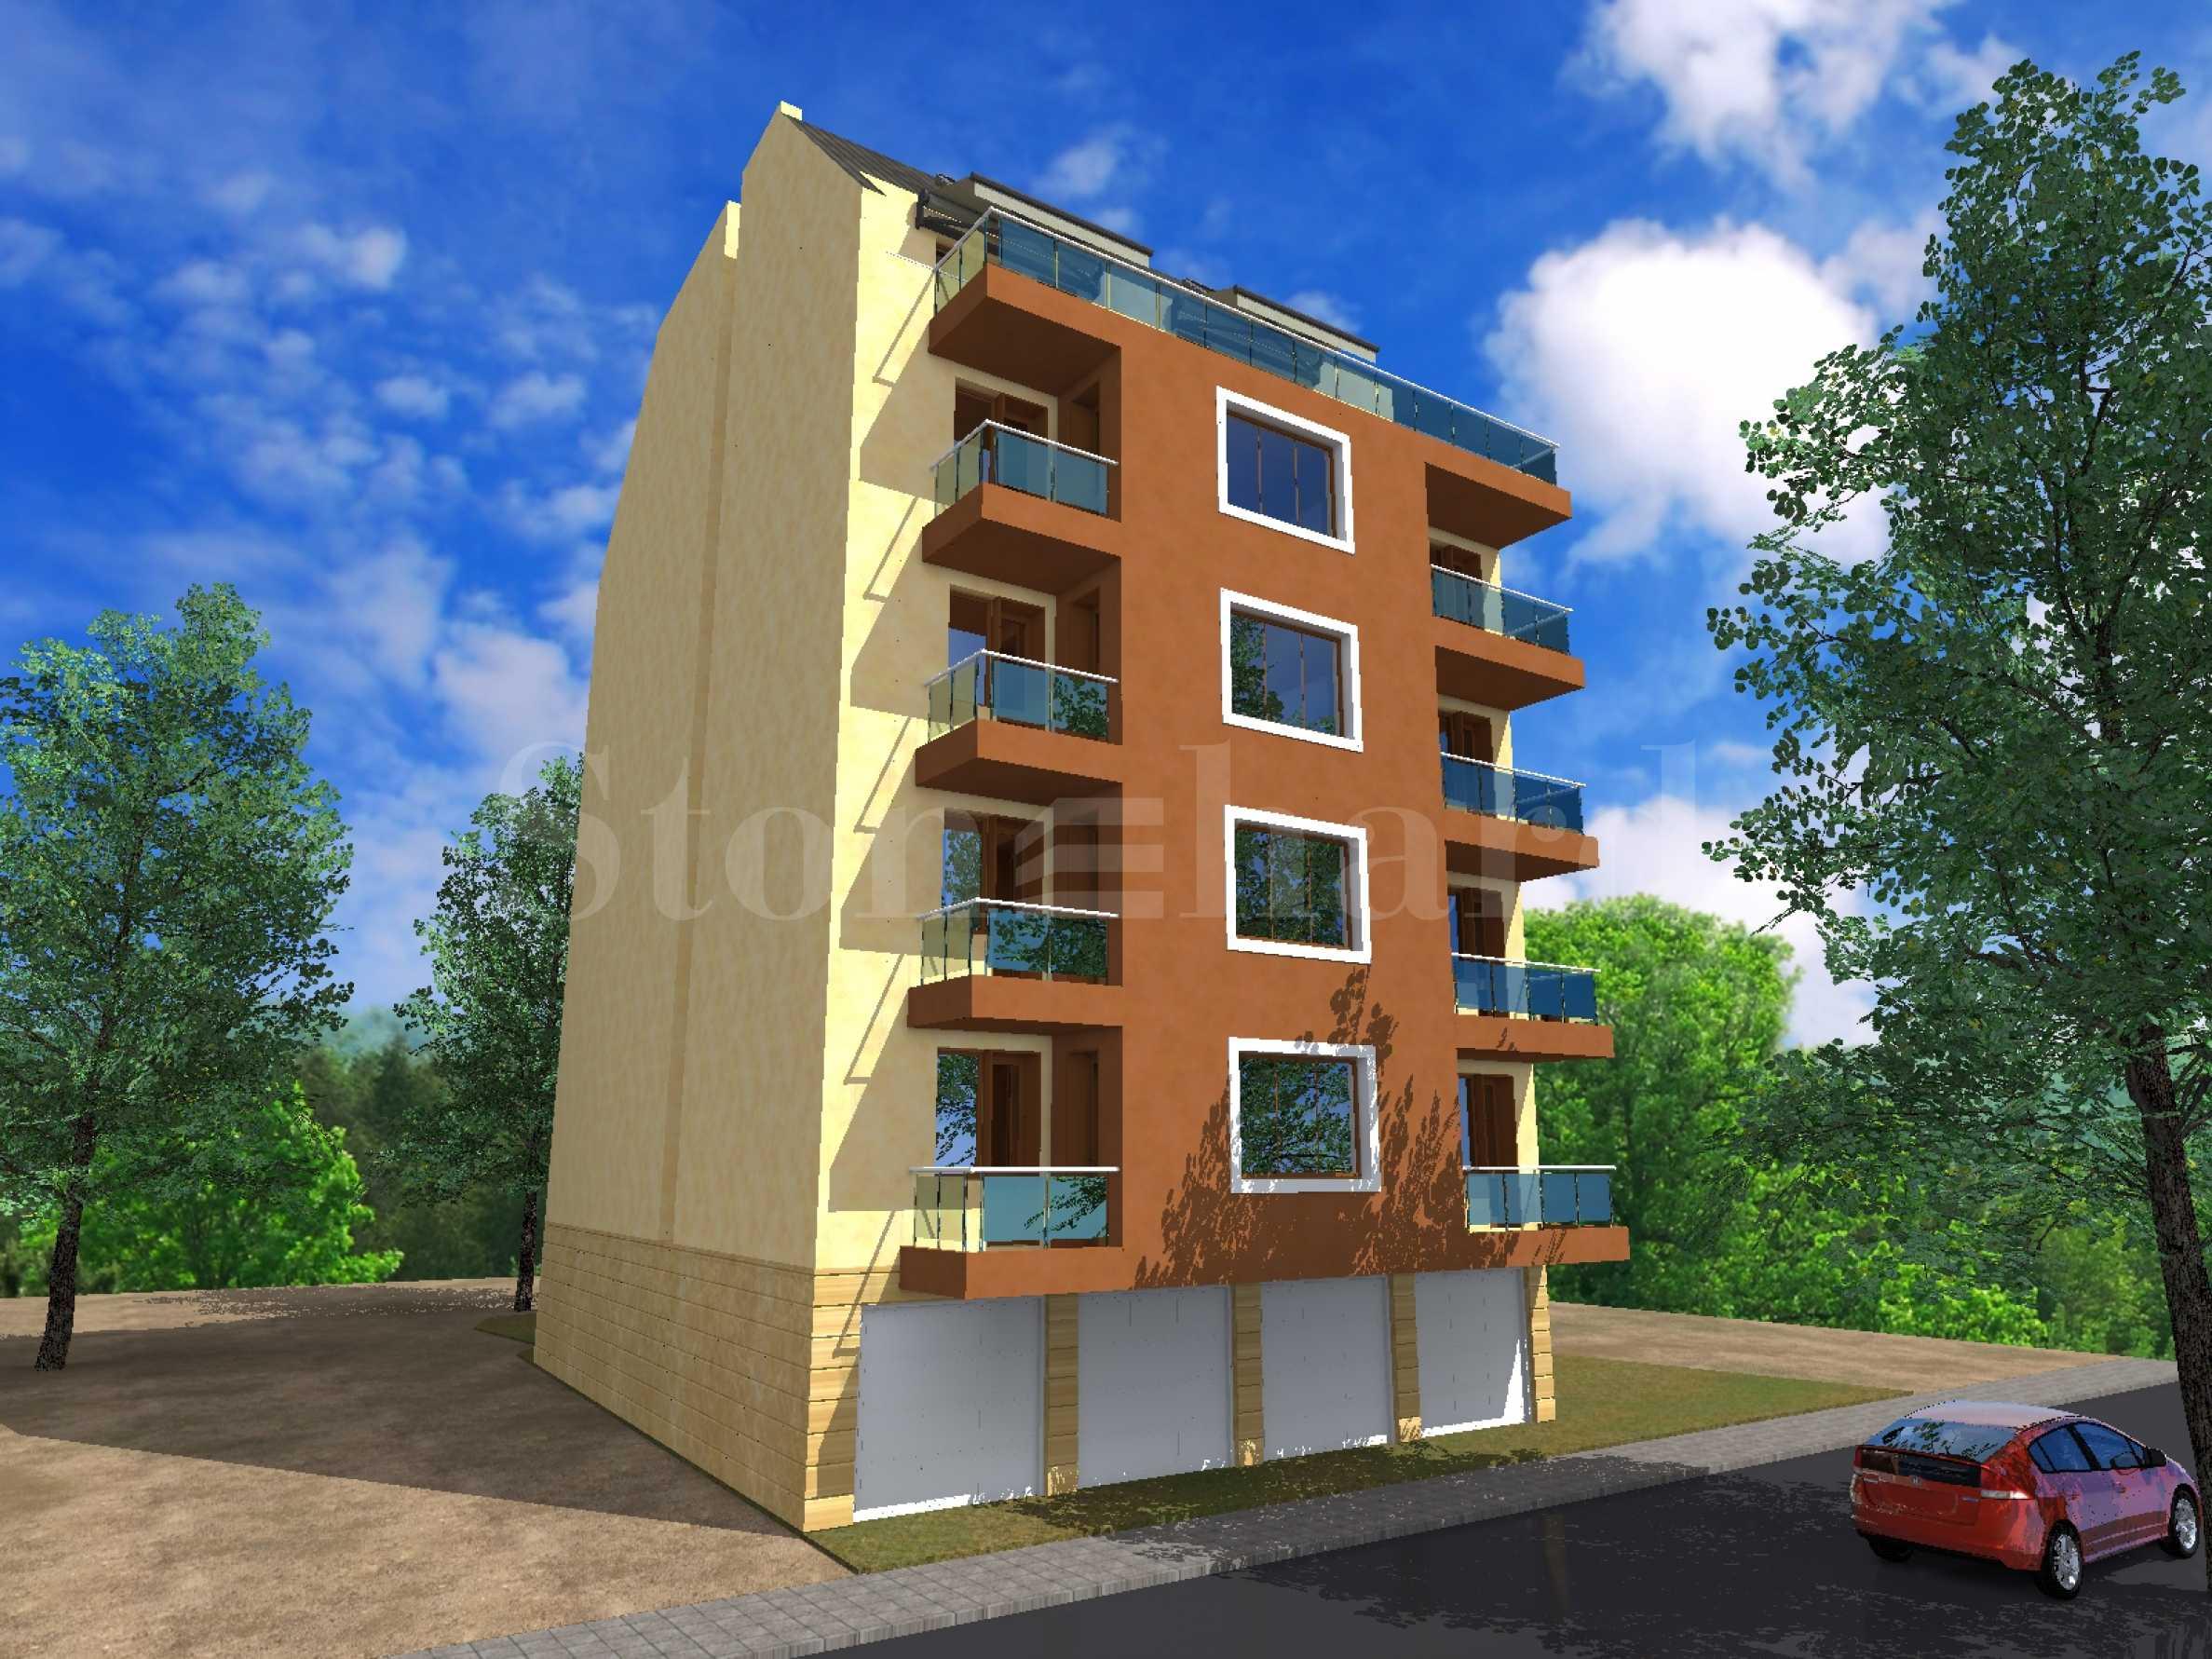 Apartment in Sofia2 - Stonehard